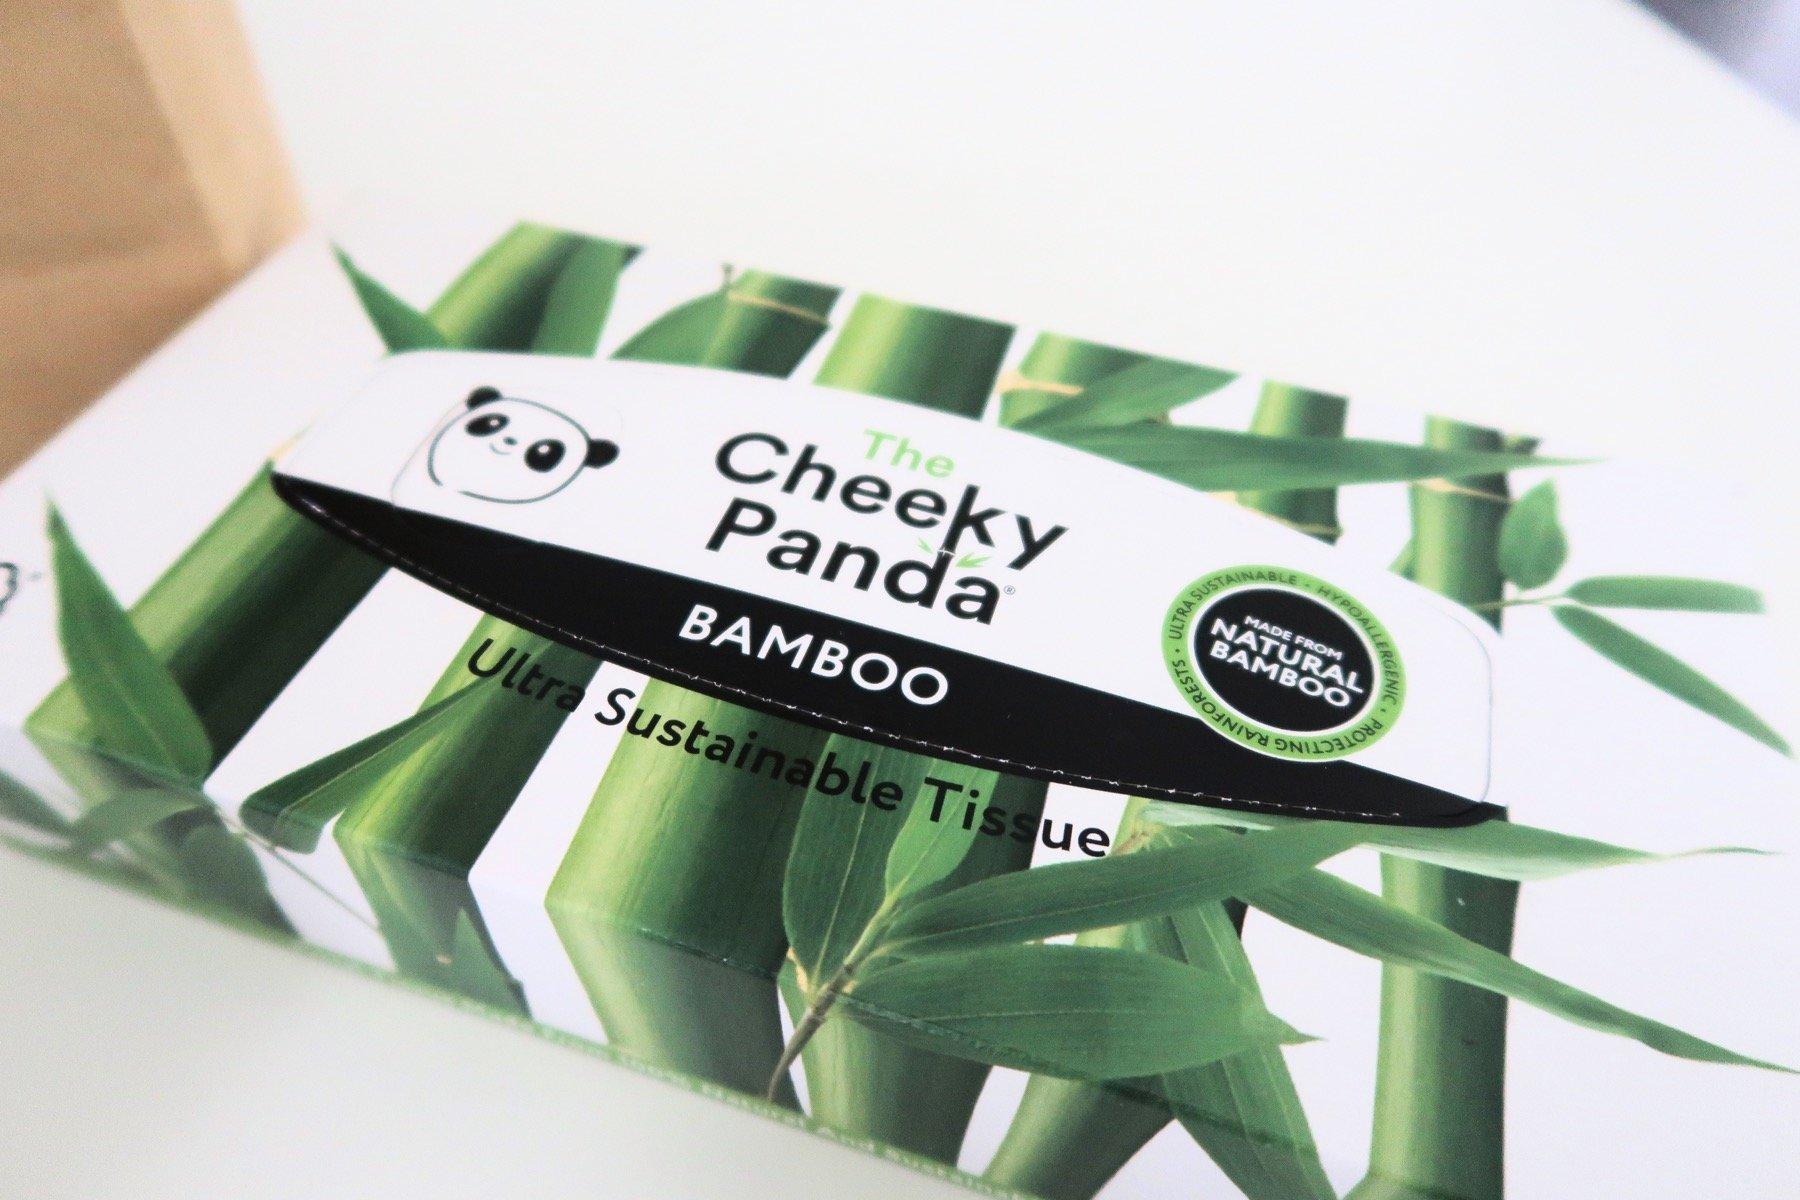 jenna minnie jennaminnie cheekypanda bamboo